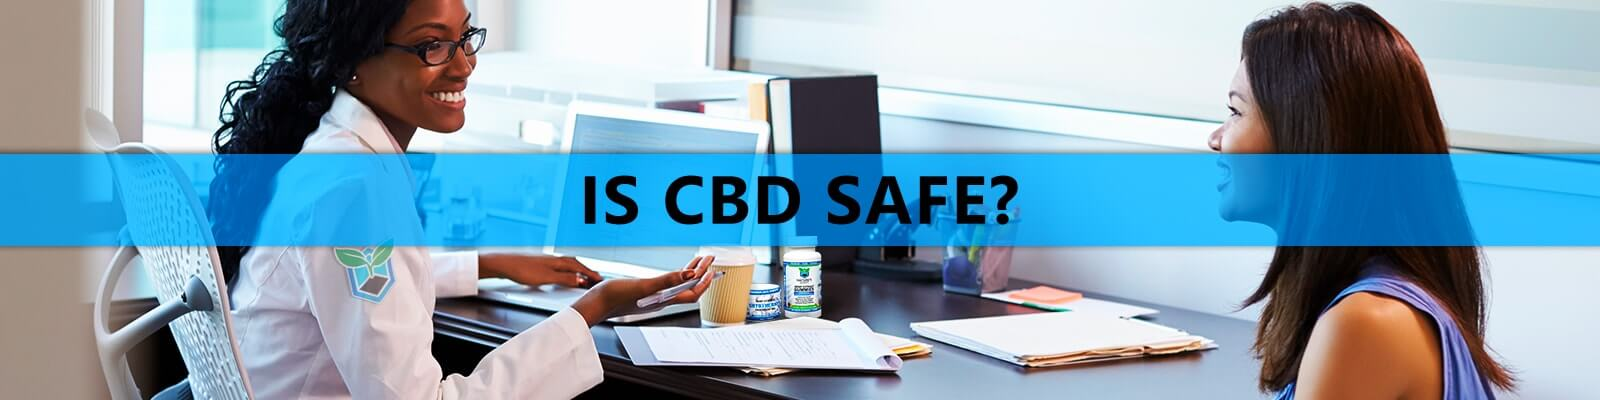 is cbd safe